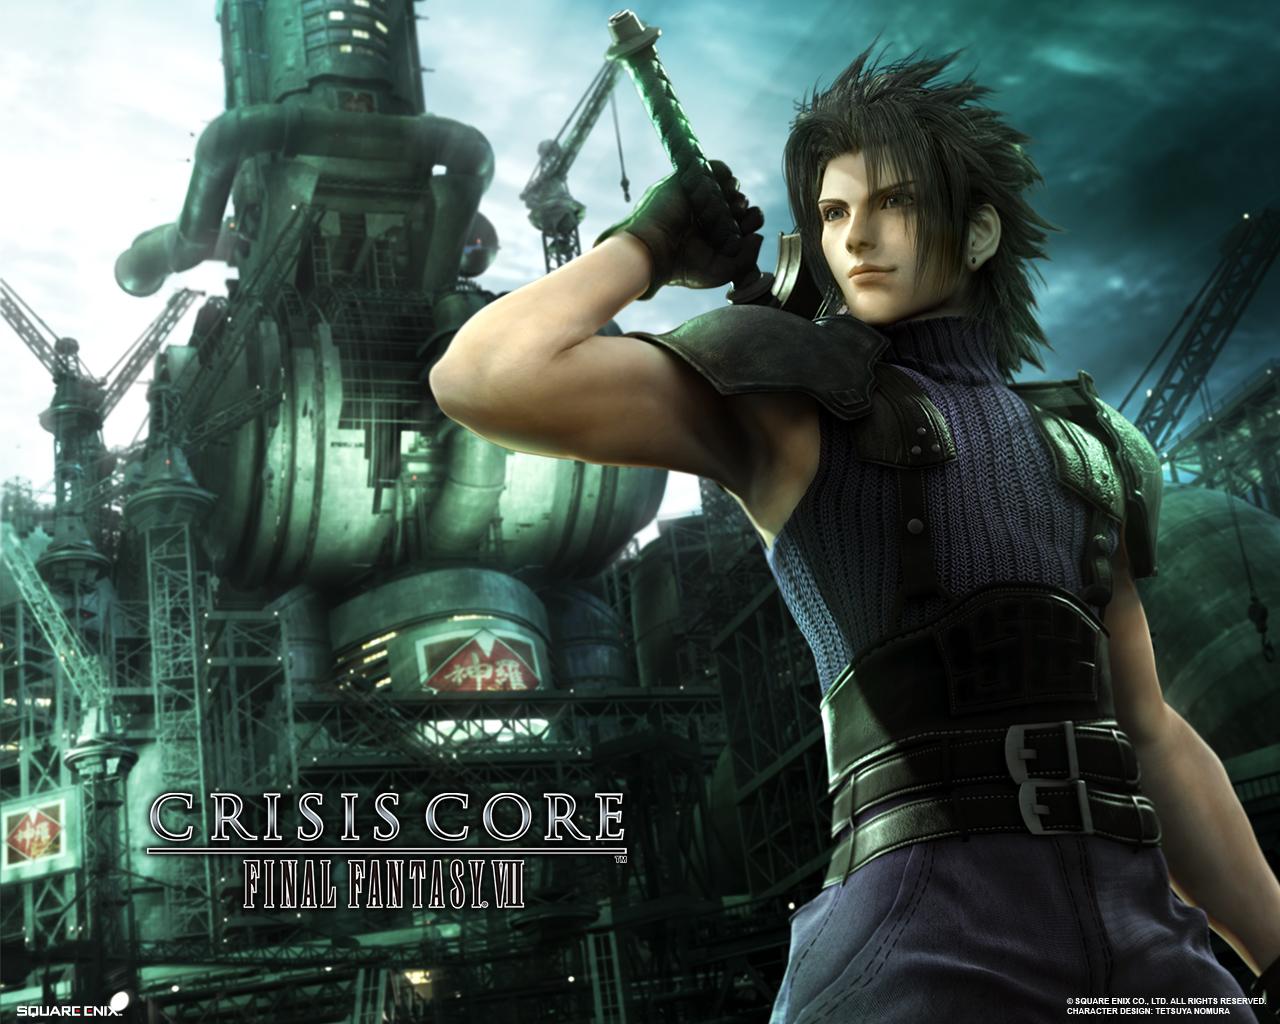 Zack Fair Quotes | Final Fantasy VII Crisis Core | Great ...